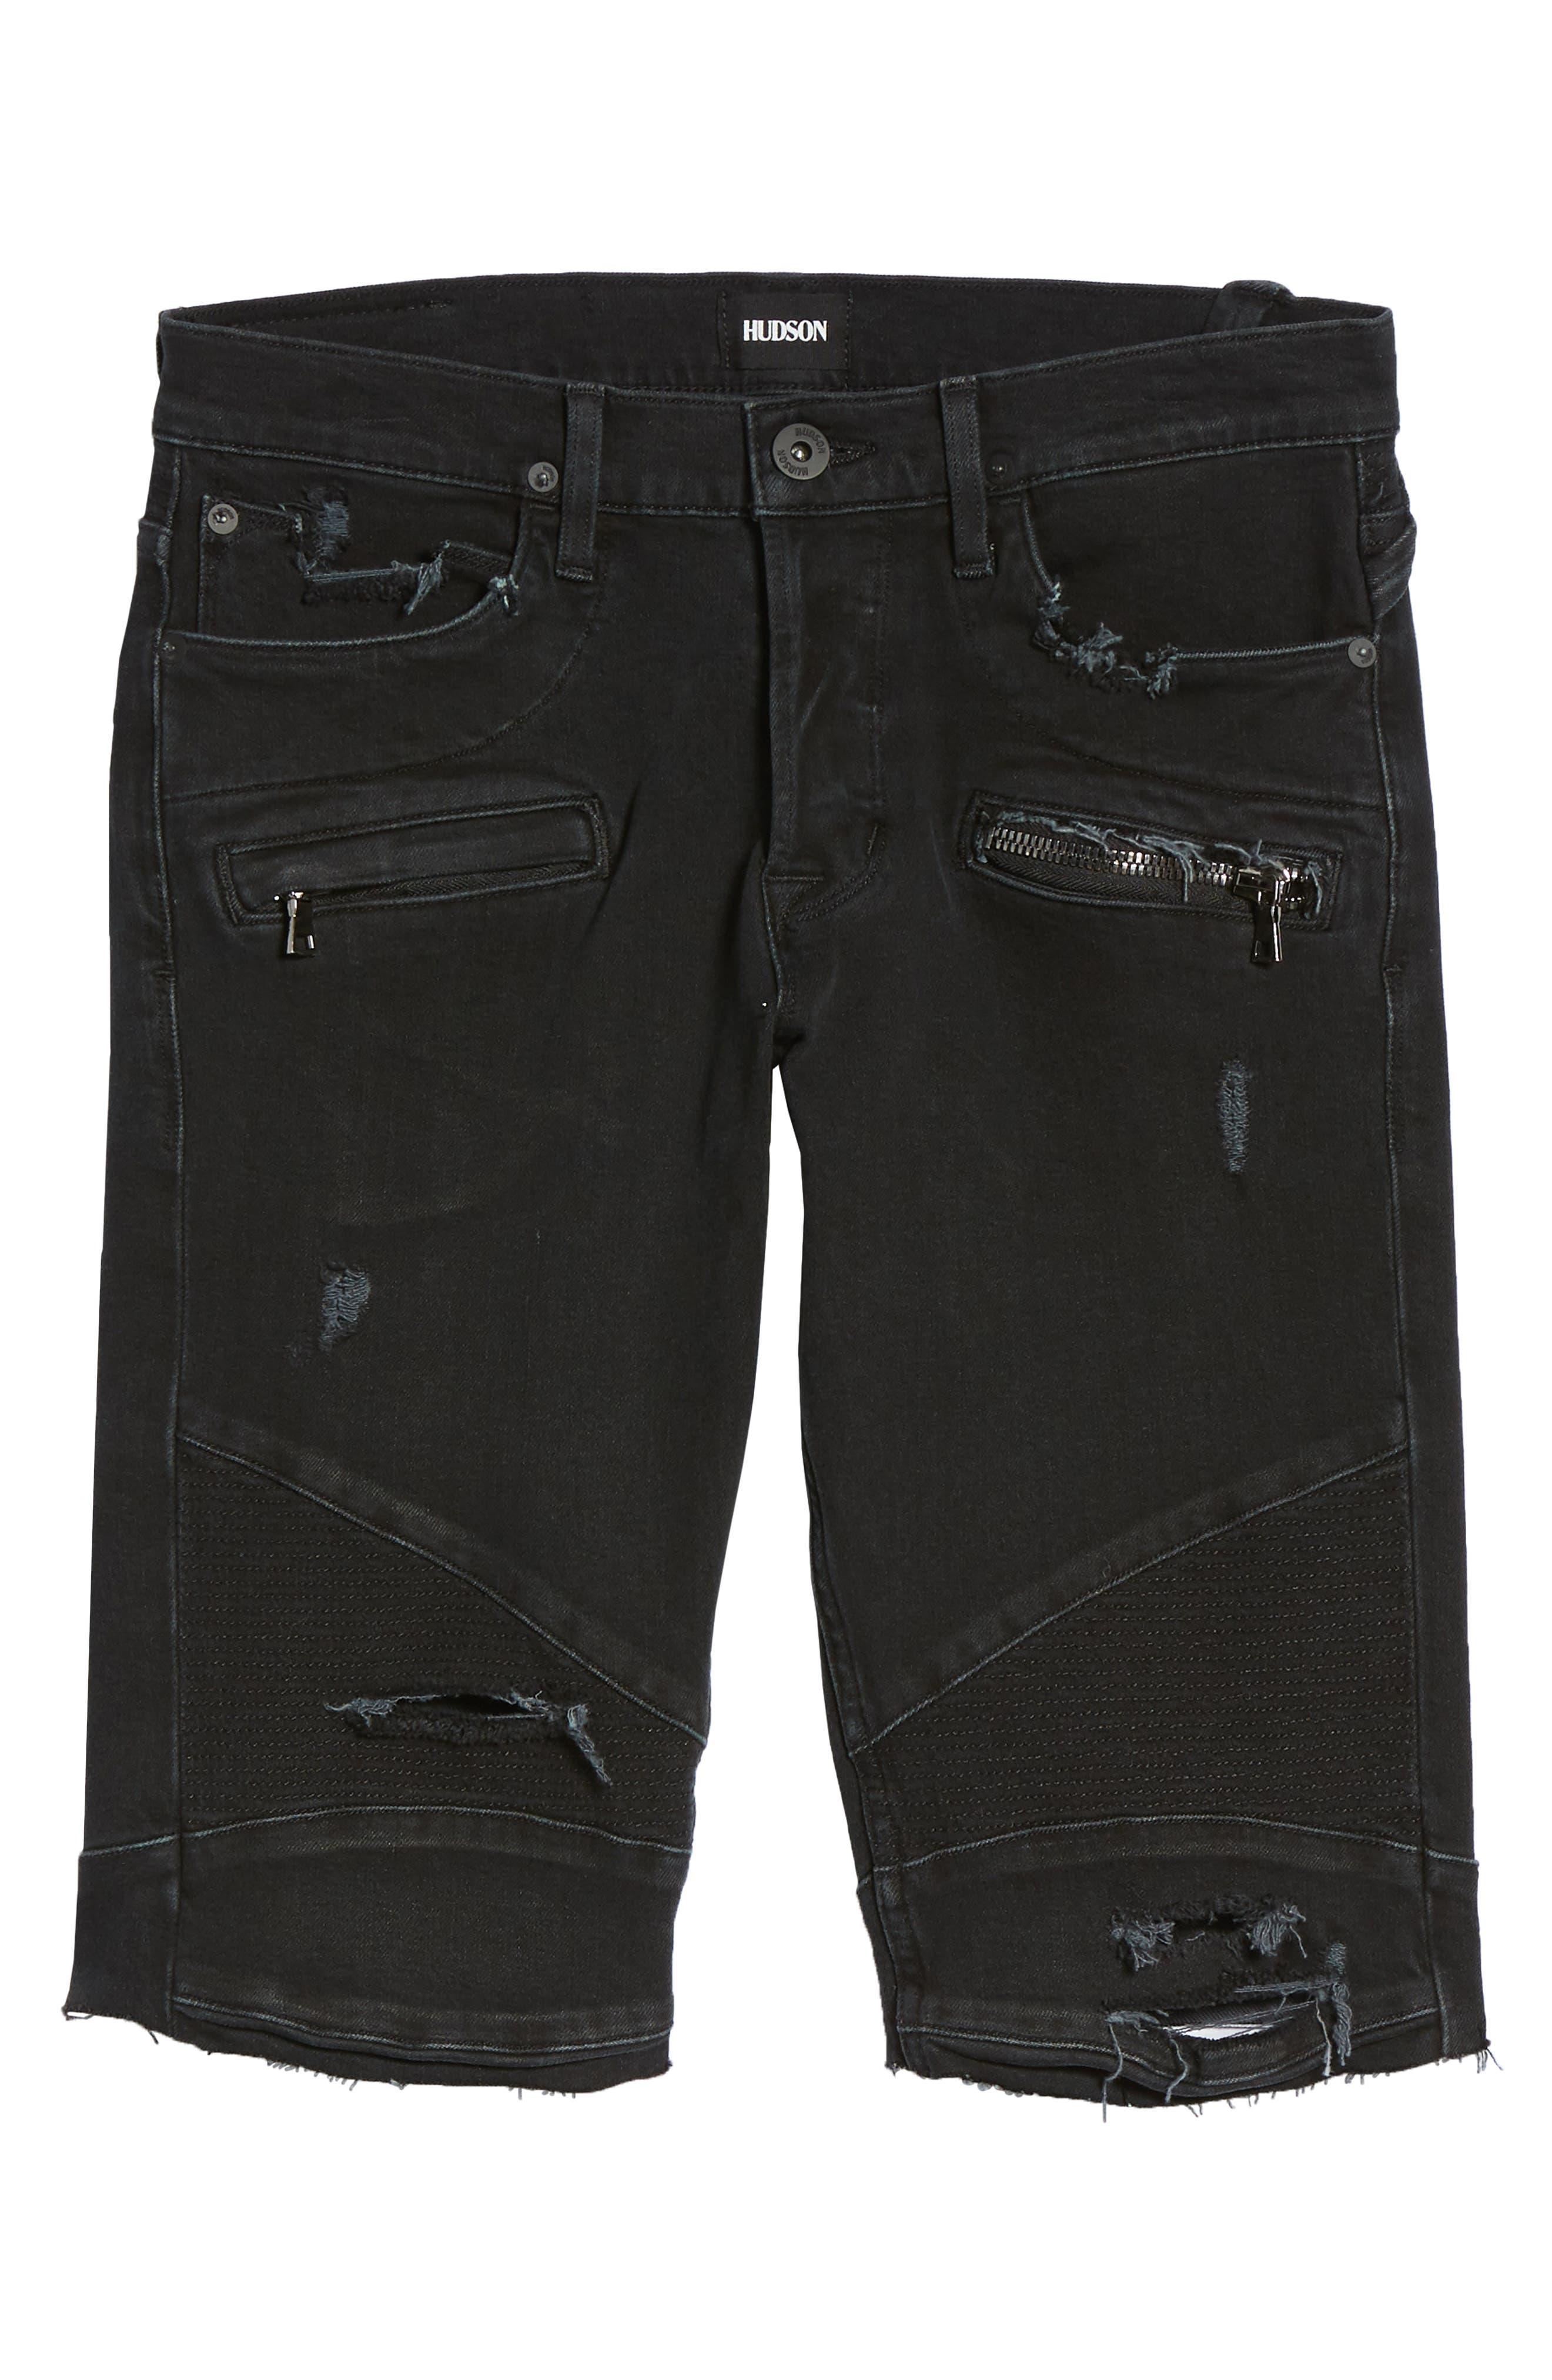 Blinder Biker Cutoff Shorts,                             Alternate thumbnail 6, color,                             Fade Away